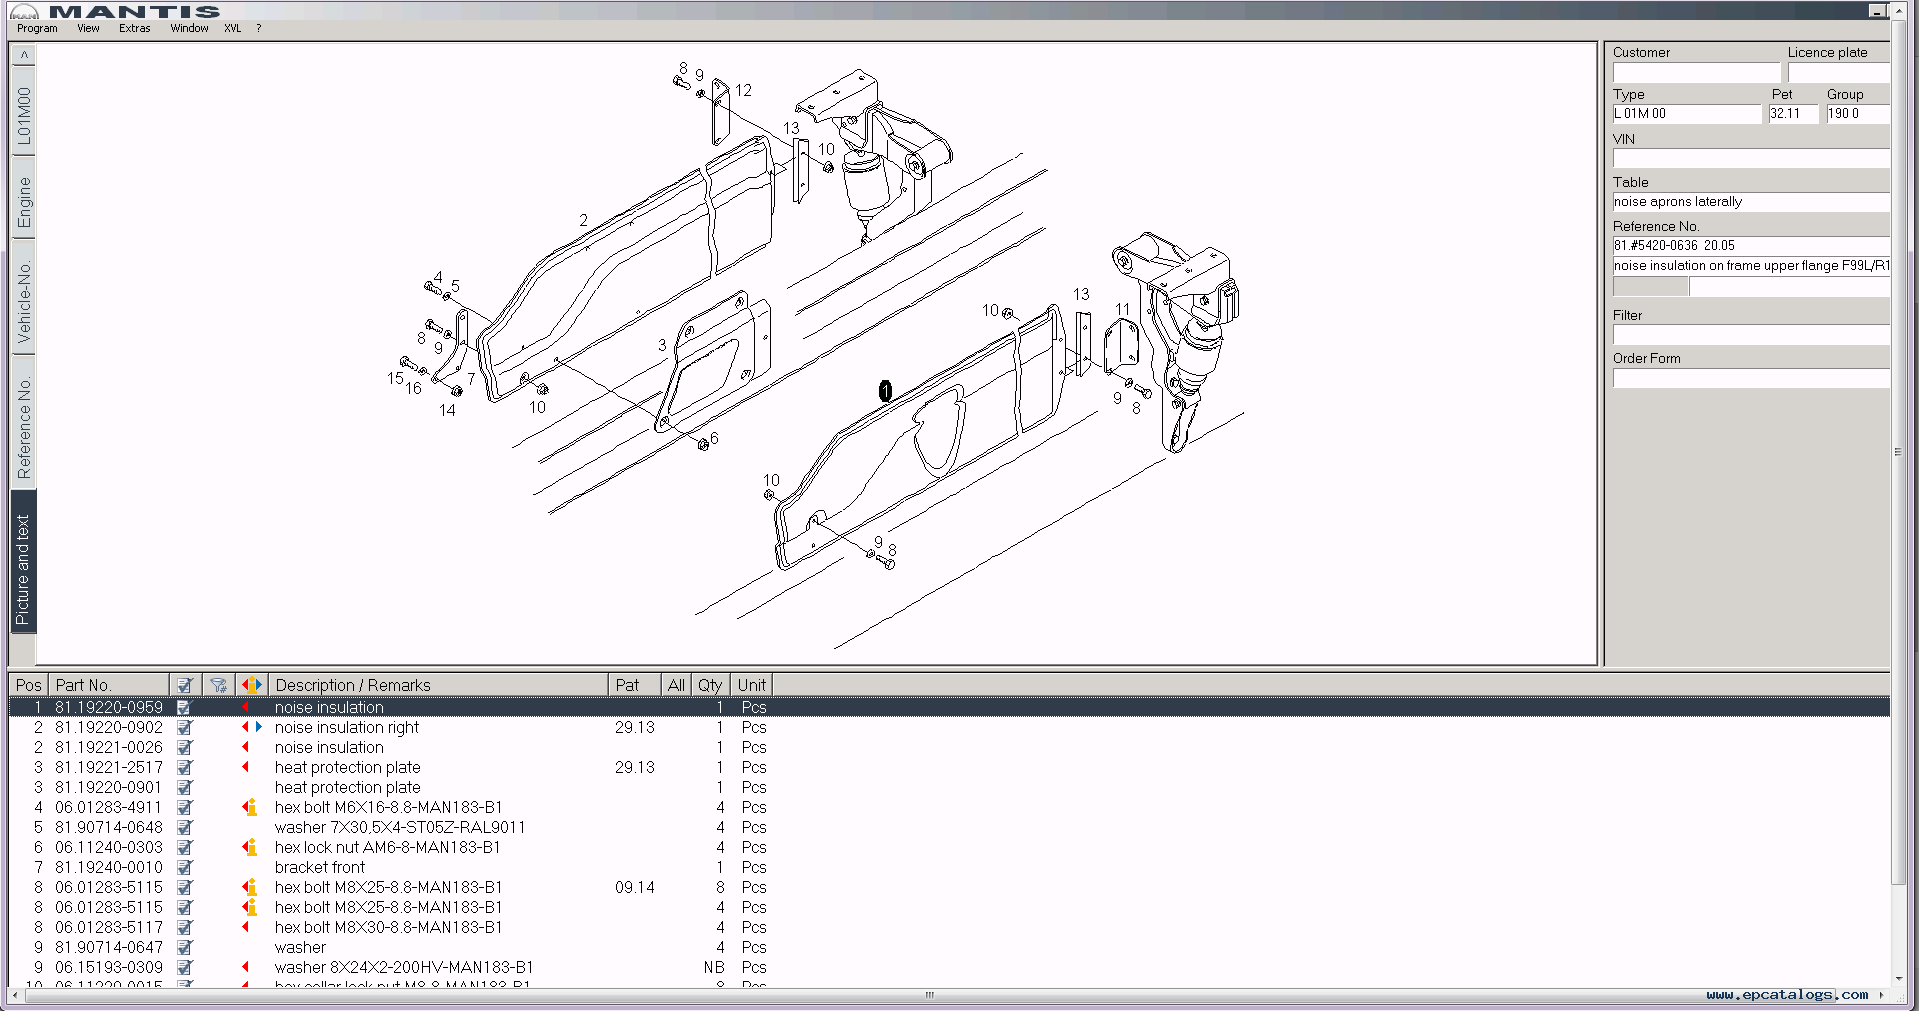 saab parts screnshoots system enchanting engine cooling wiring diagram skewred